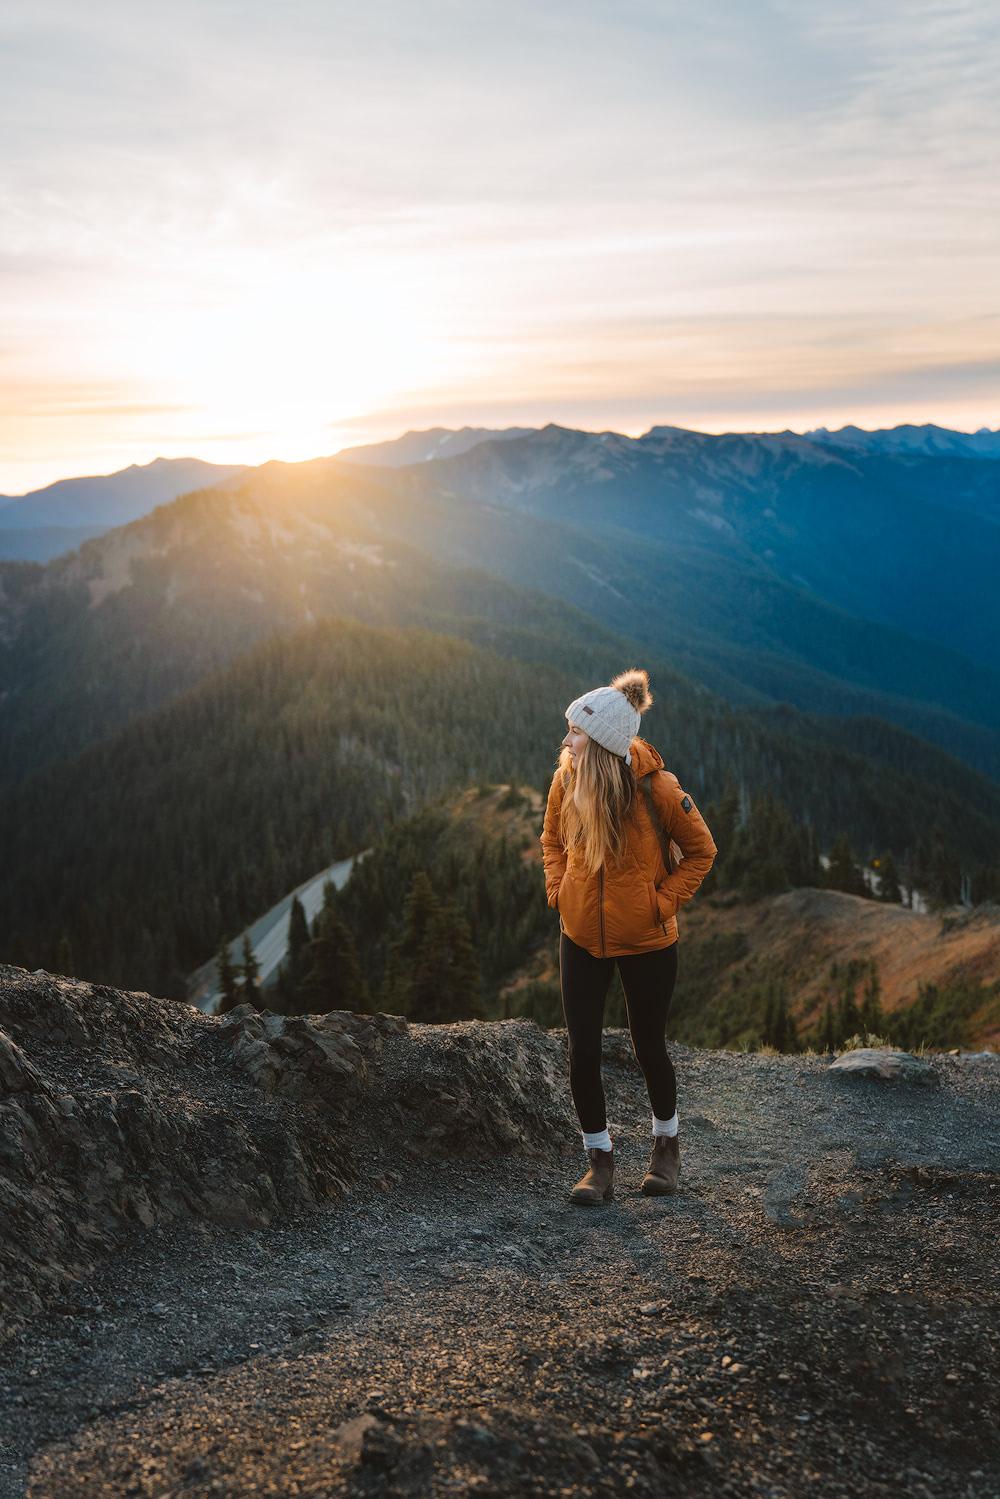 Olympic National Park Adventure Getaway 24 Hour Itinerary from Seattle Renee Roaming Hurricane Ridge Sunrise 3